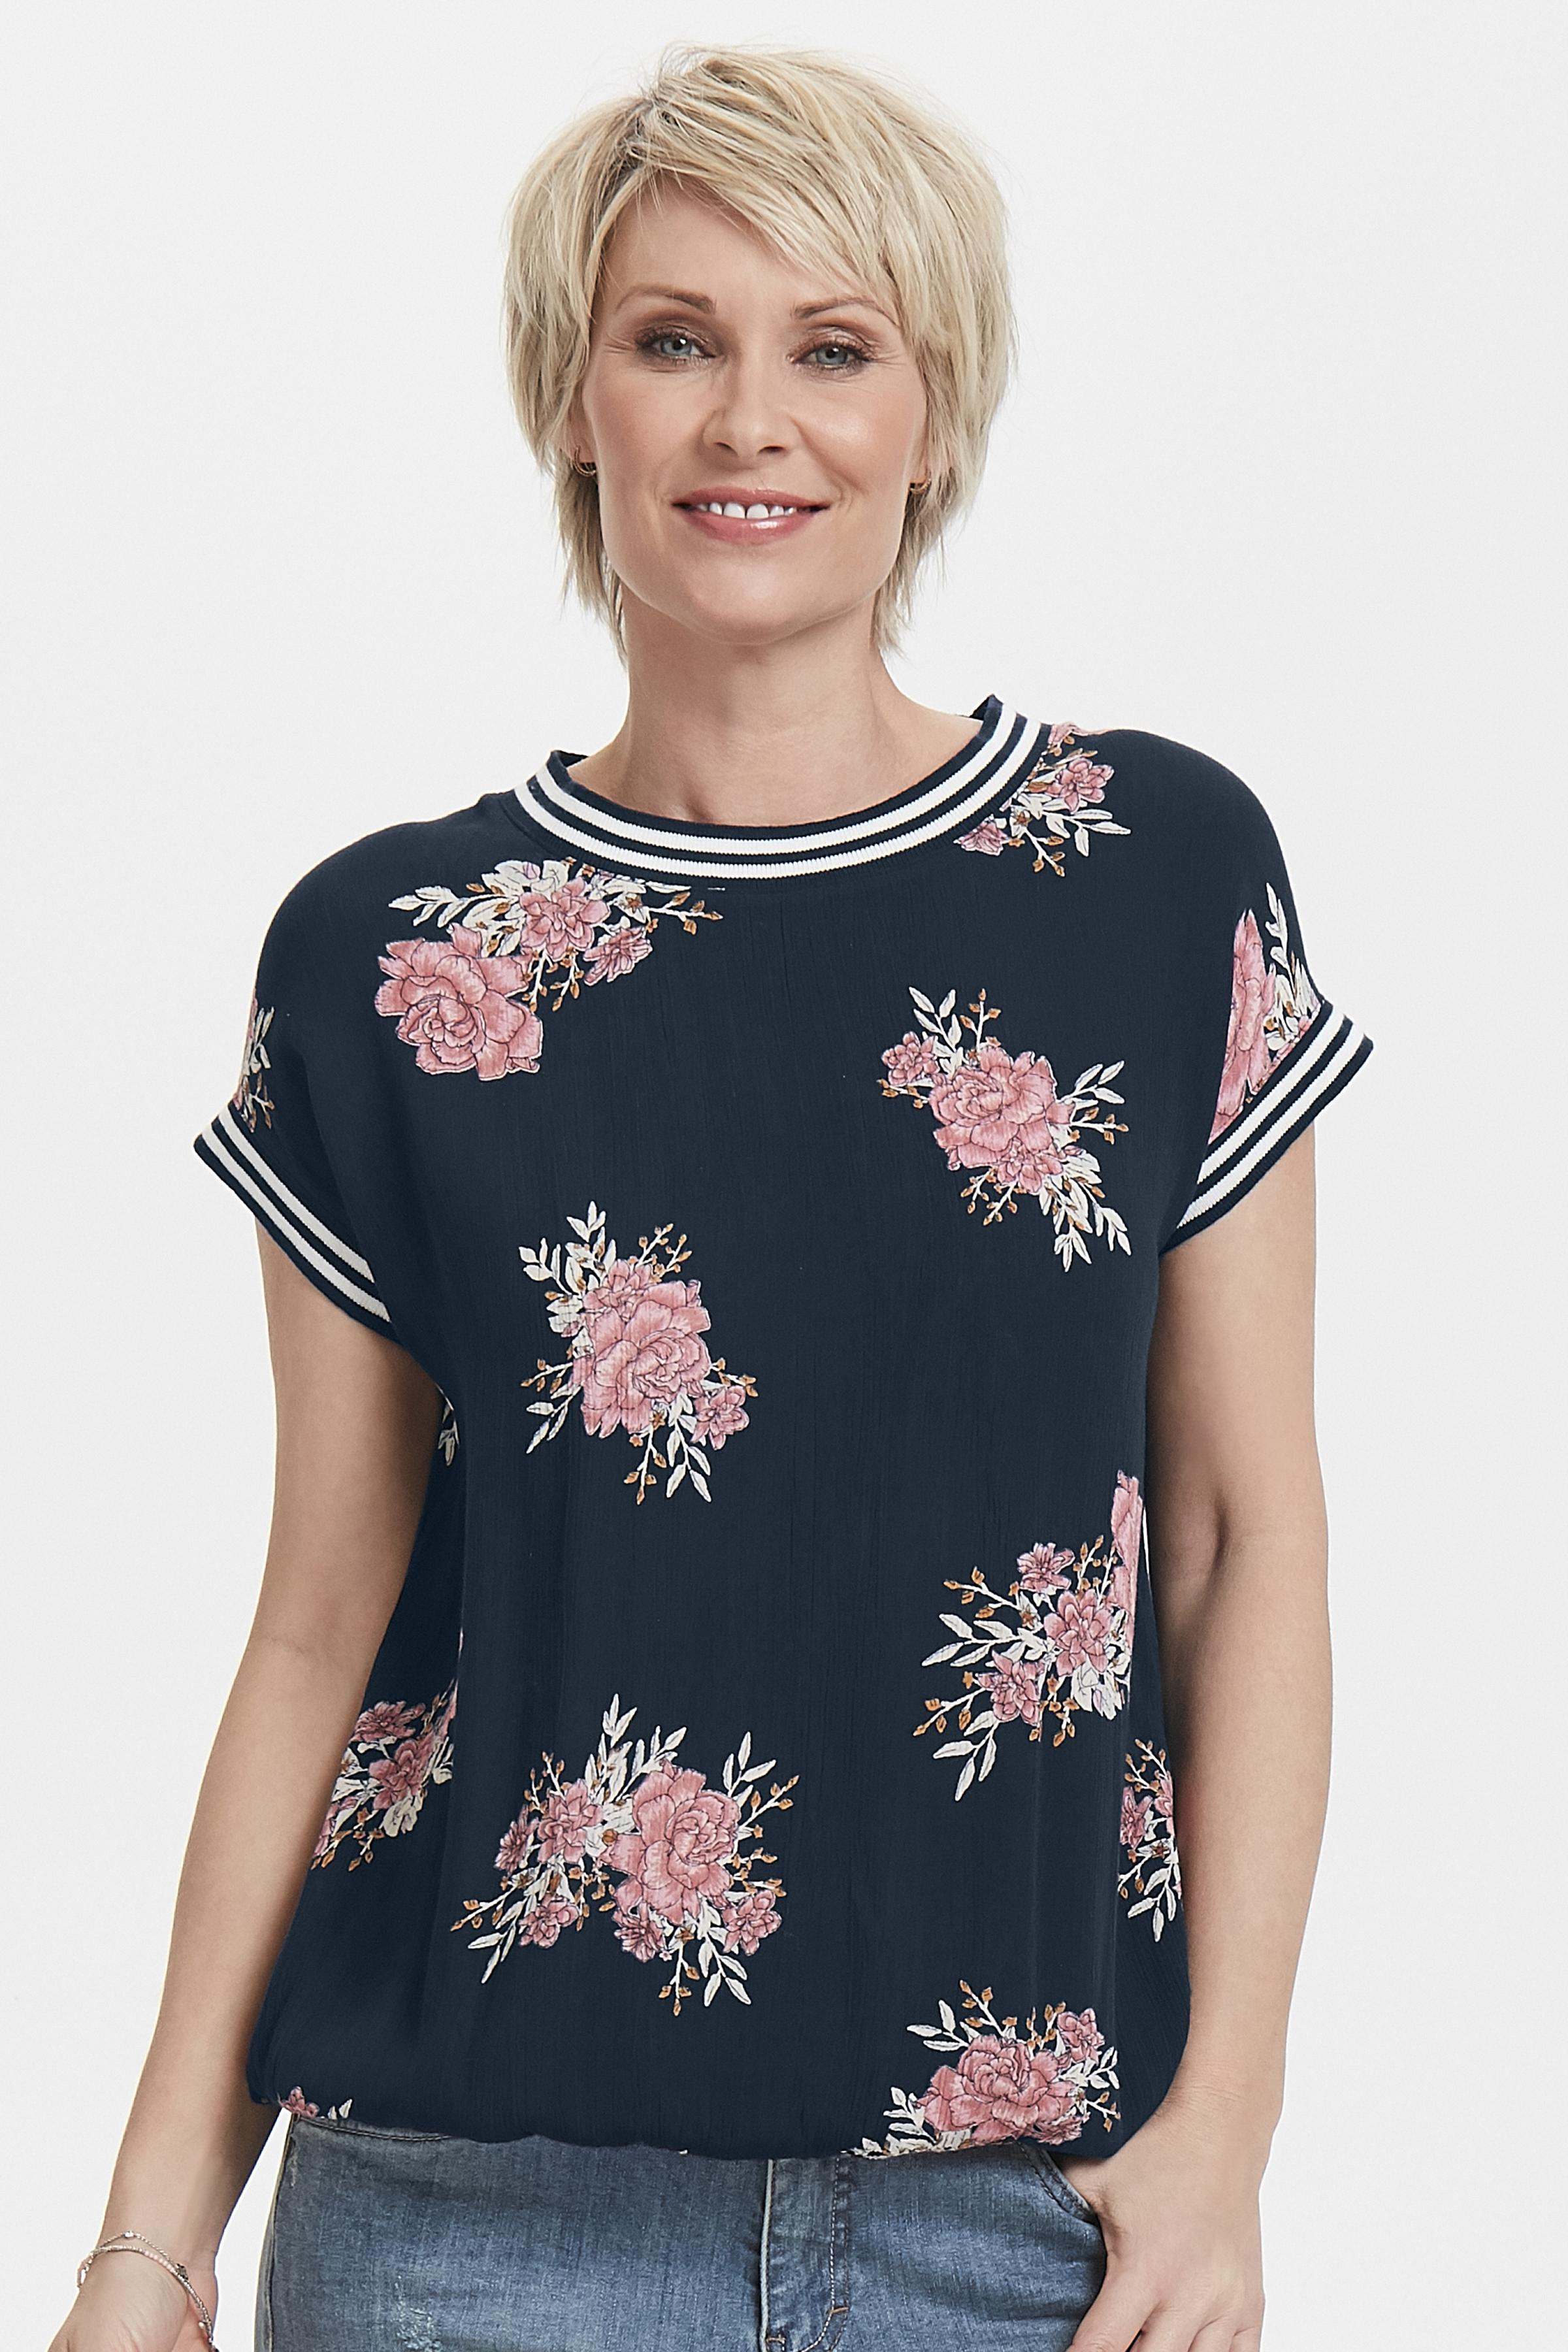 Marineblauw/roze Korte mouwen shirt  van Bon'A Parte – Door Marineblauw/roze Korte mouwen shirt  van maat. S-2XL hier